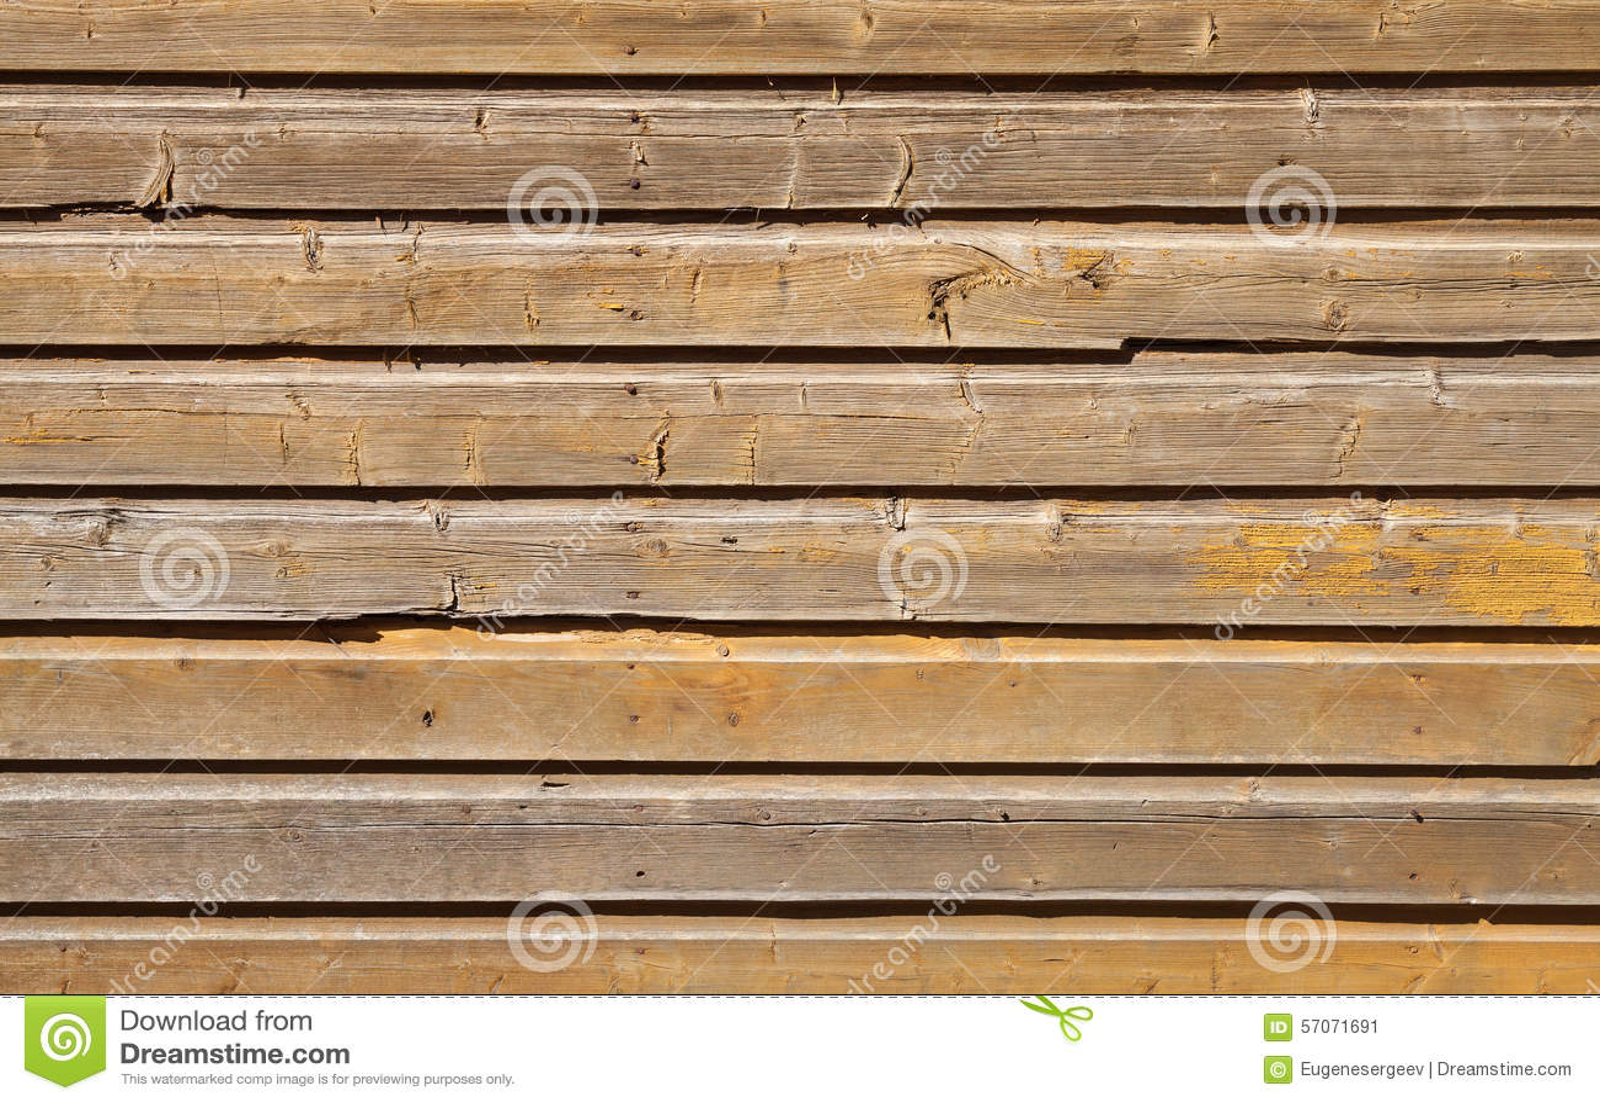 Oude houten muur met gebarsten gele verflaag